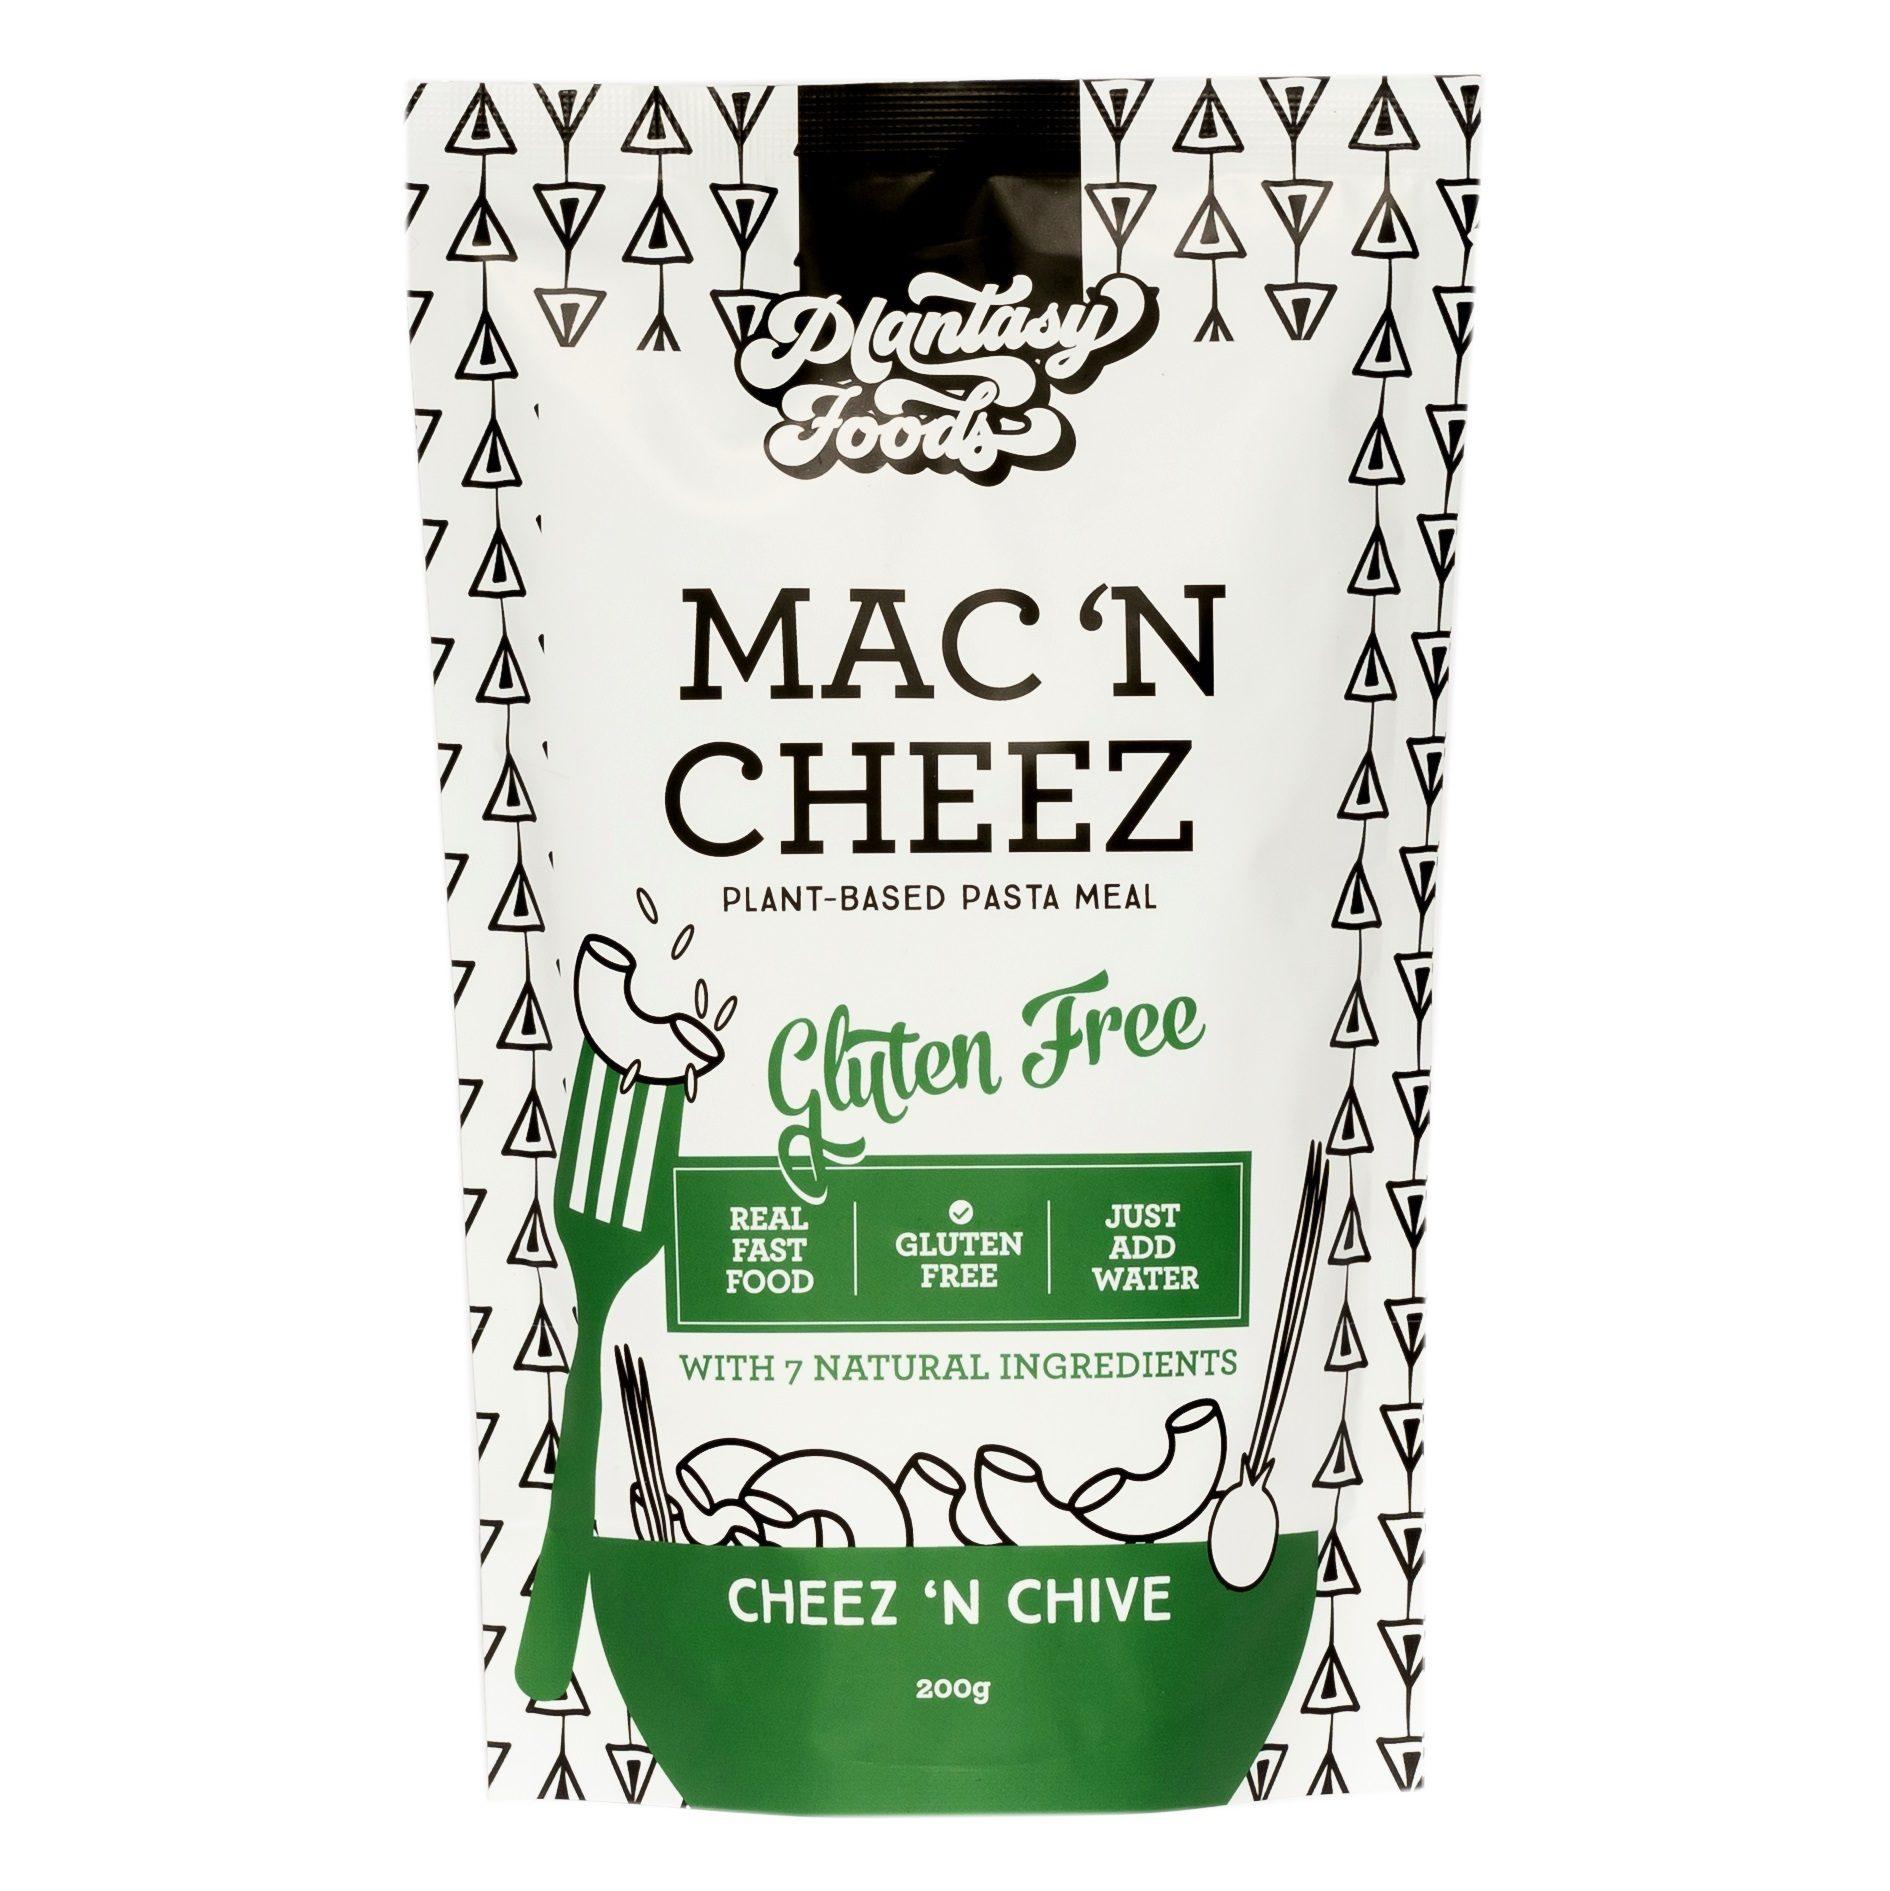 Mac 'n Cheez - 10 BULK PACK - Chive - Vegan, Gluten Free ...